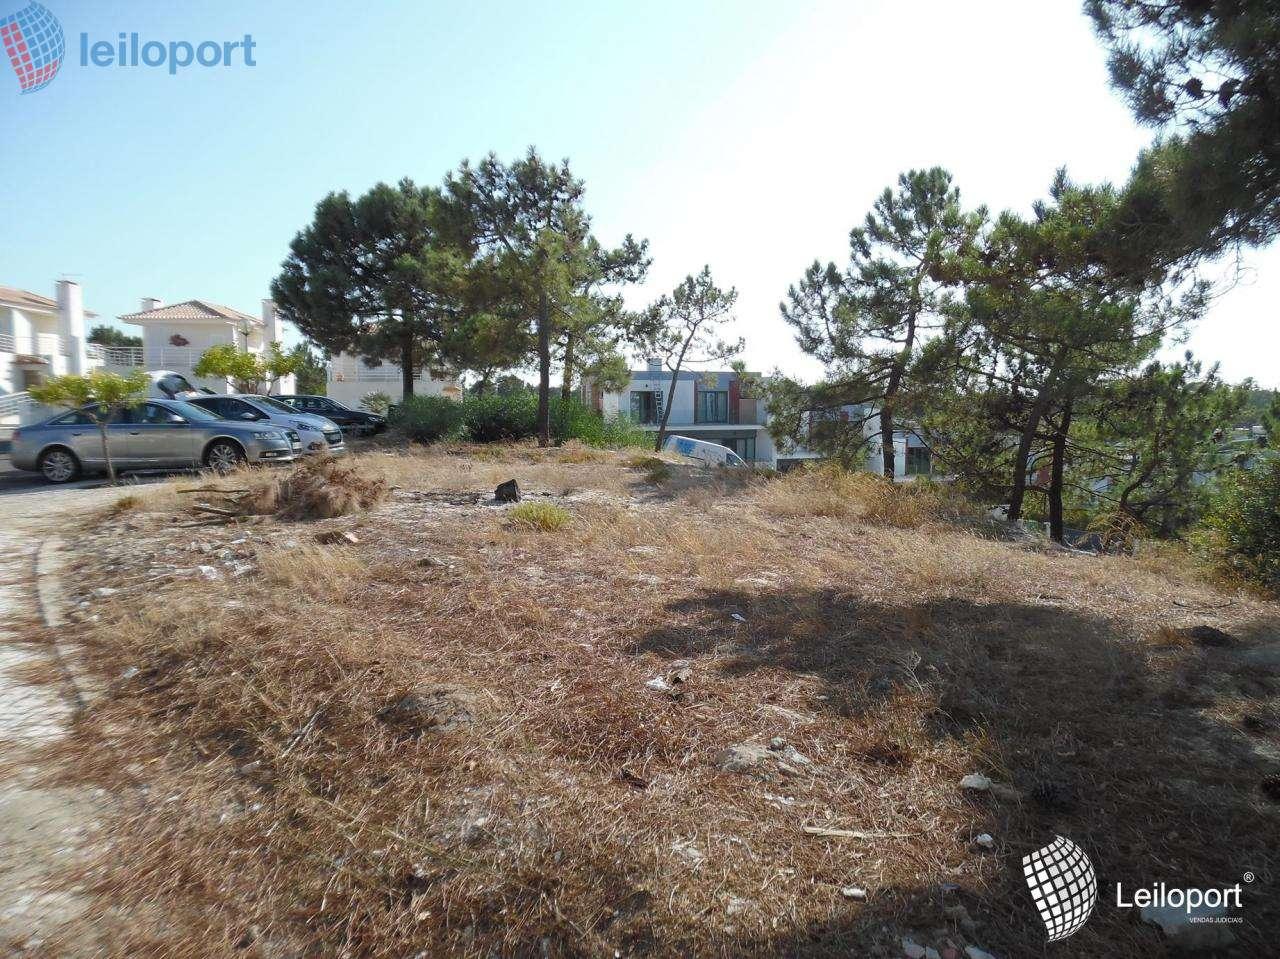 Terreno para comprar, Carvalhal, Setúbal - Foto 1